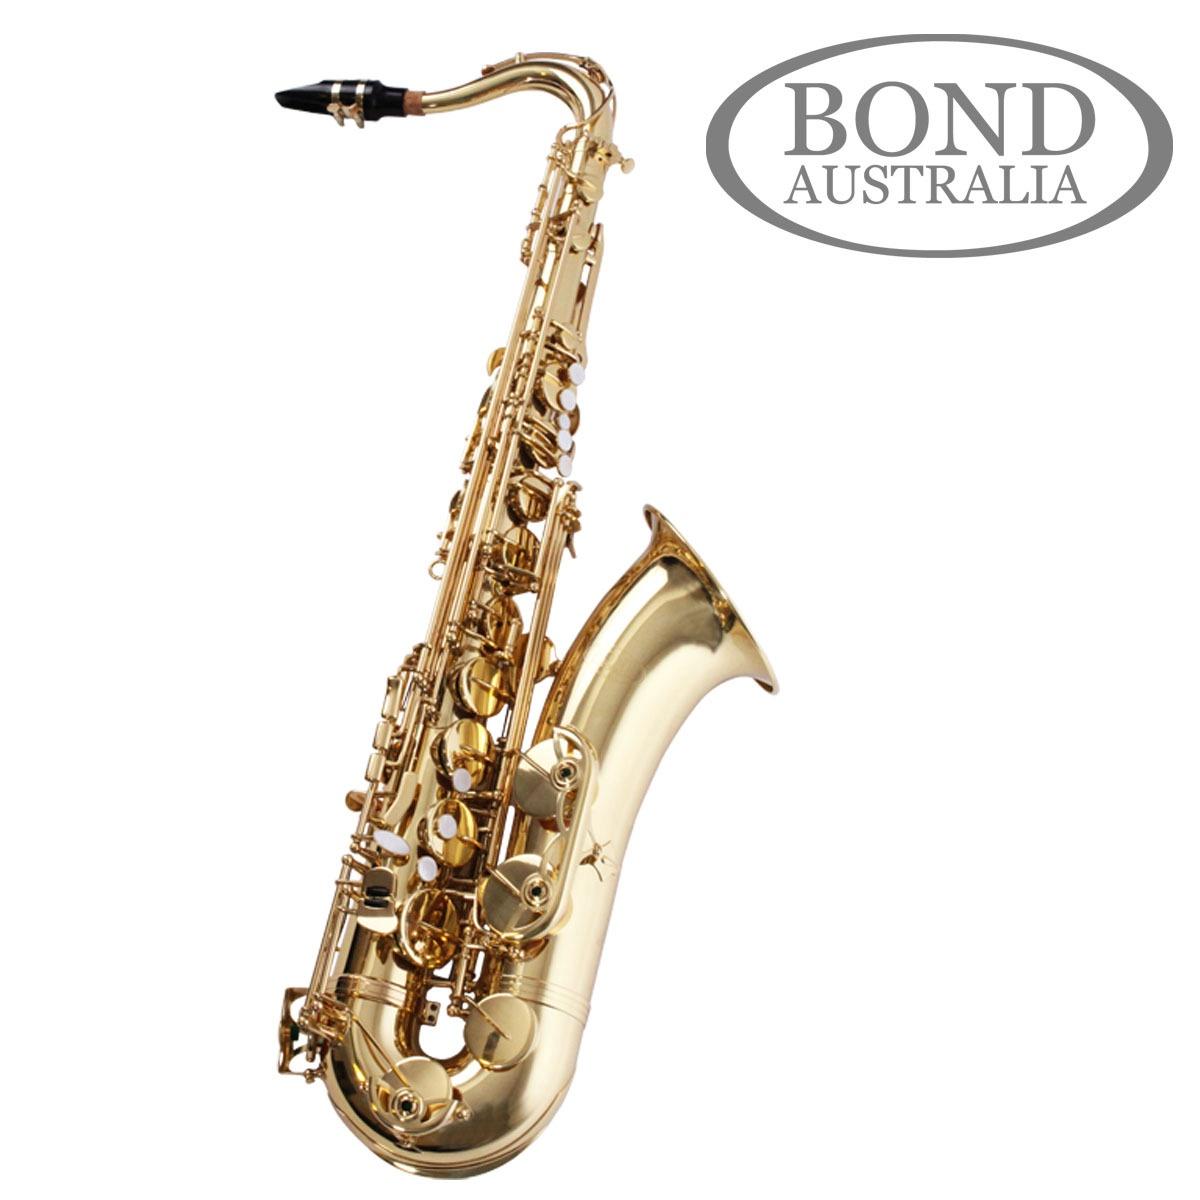 Bond Australia Tenor Saxophone